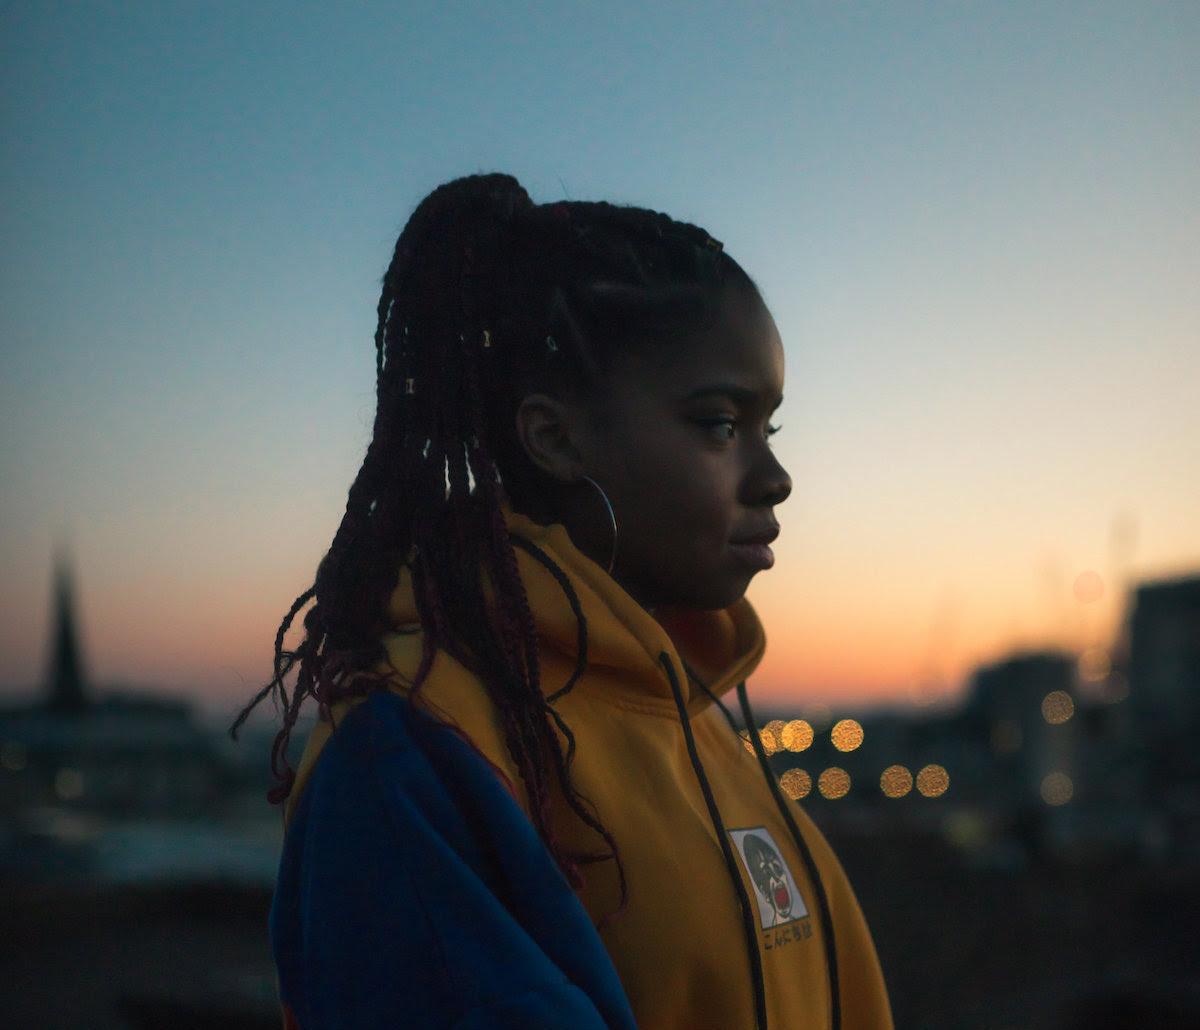 Best New Music Of The Week // April 22 – April 28, 2019 - WE PLUG